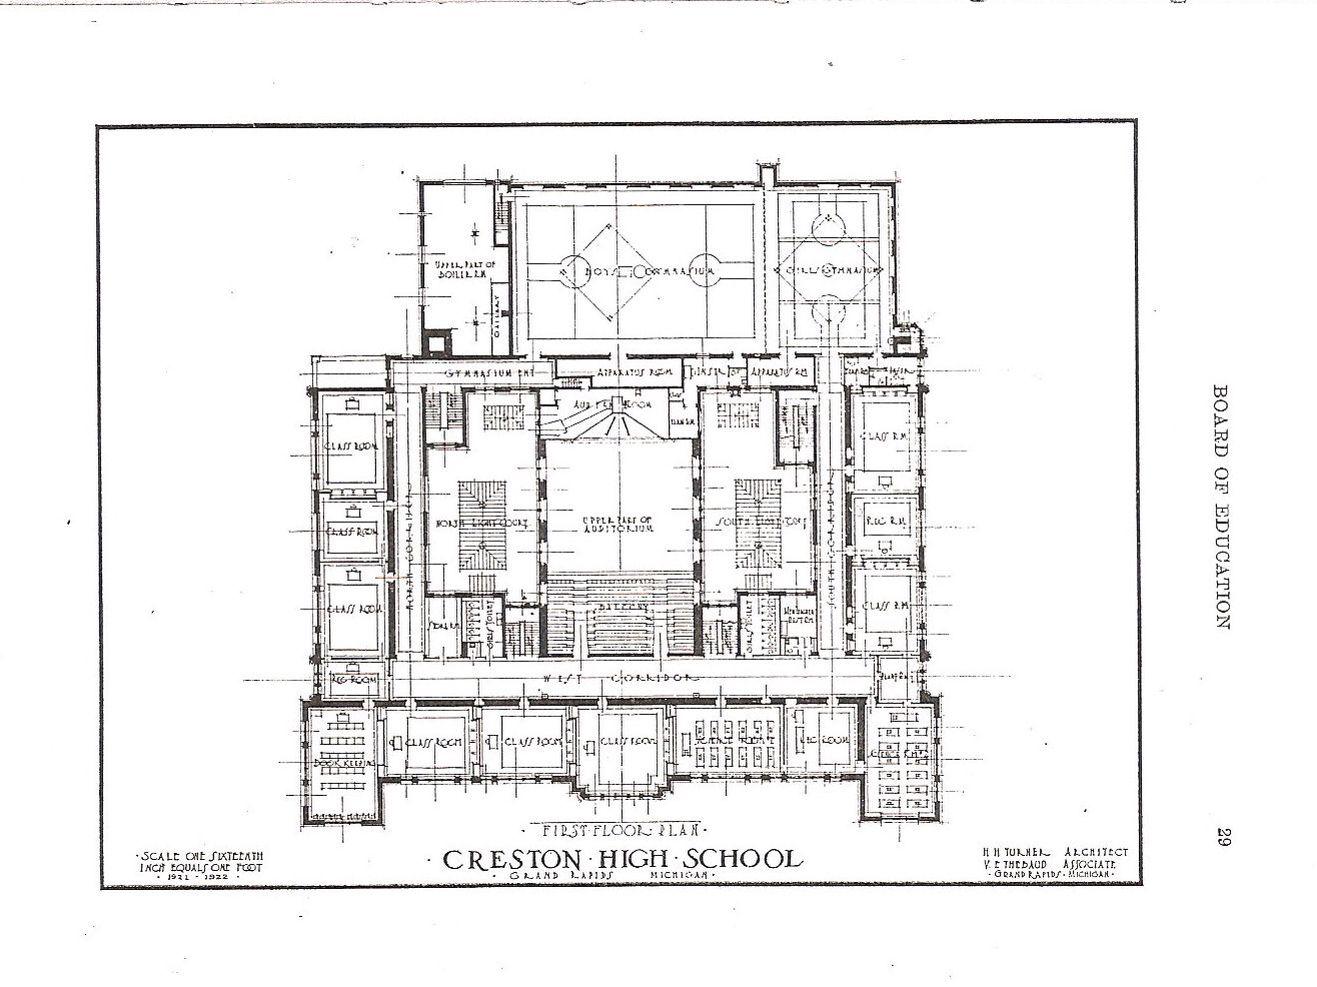 Creston High School, 1922 original blue prints, second floor.